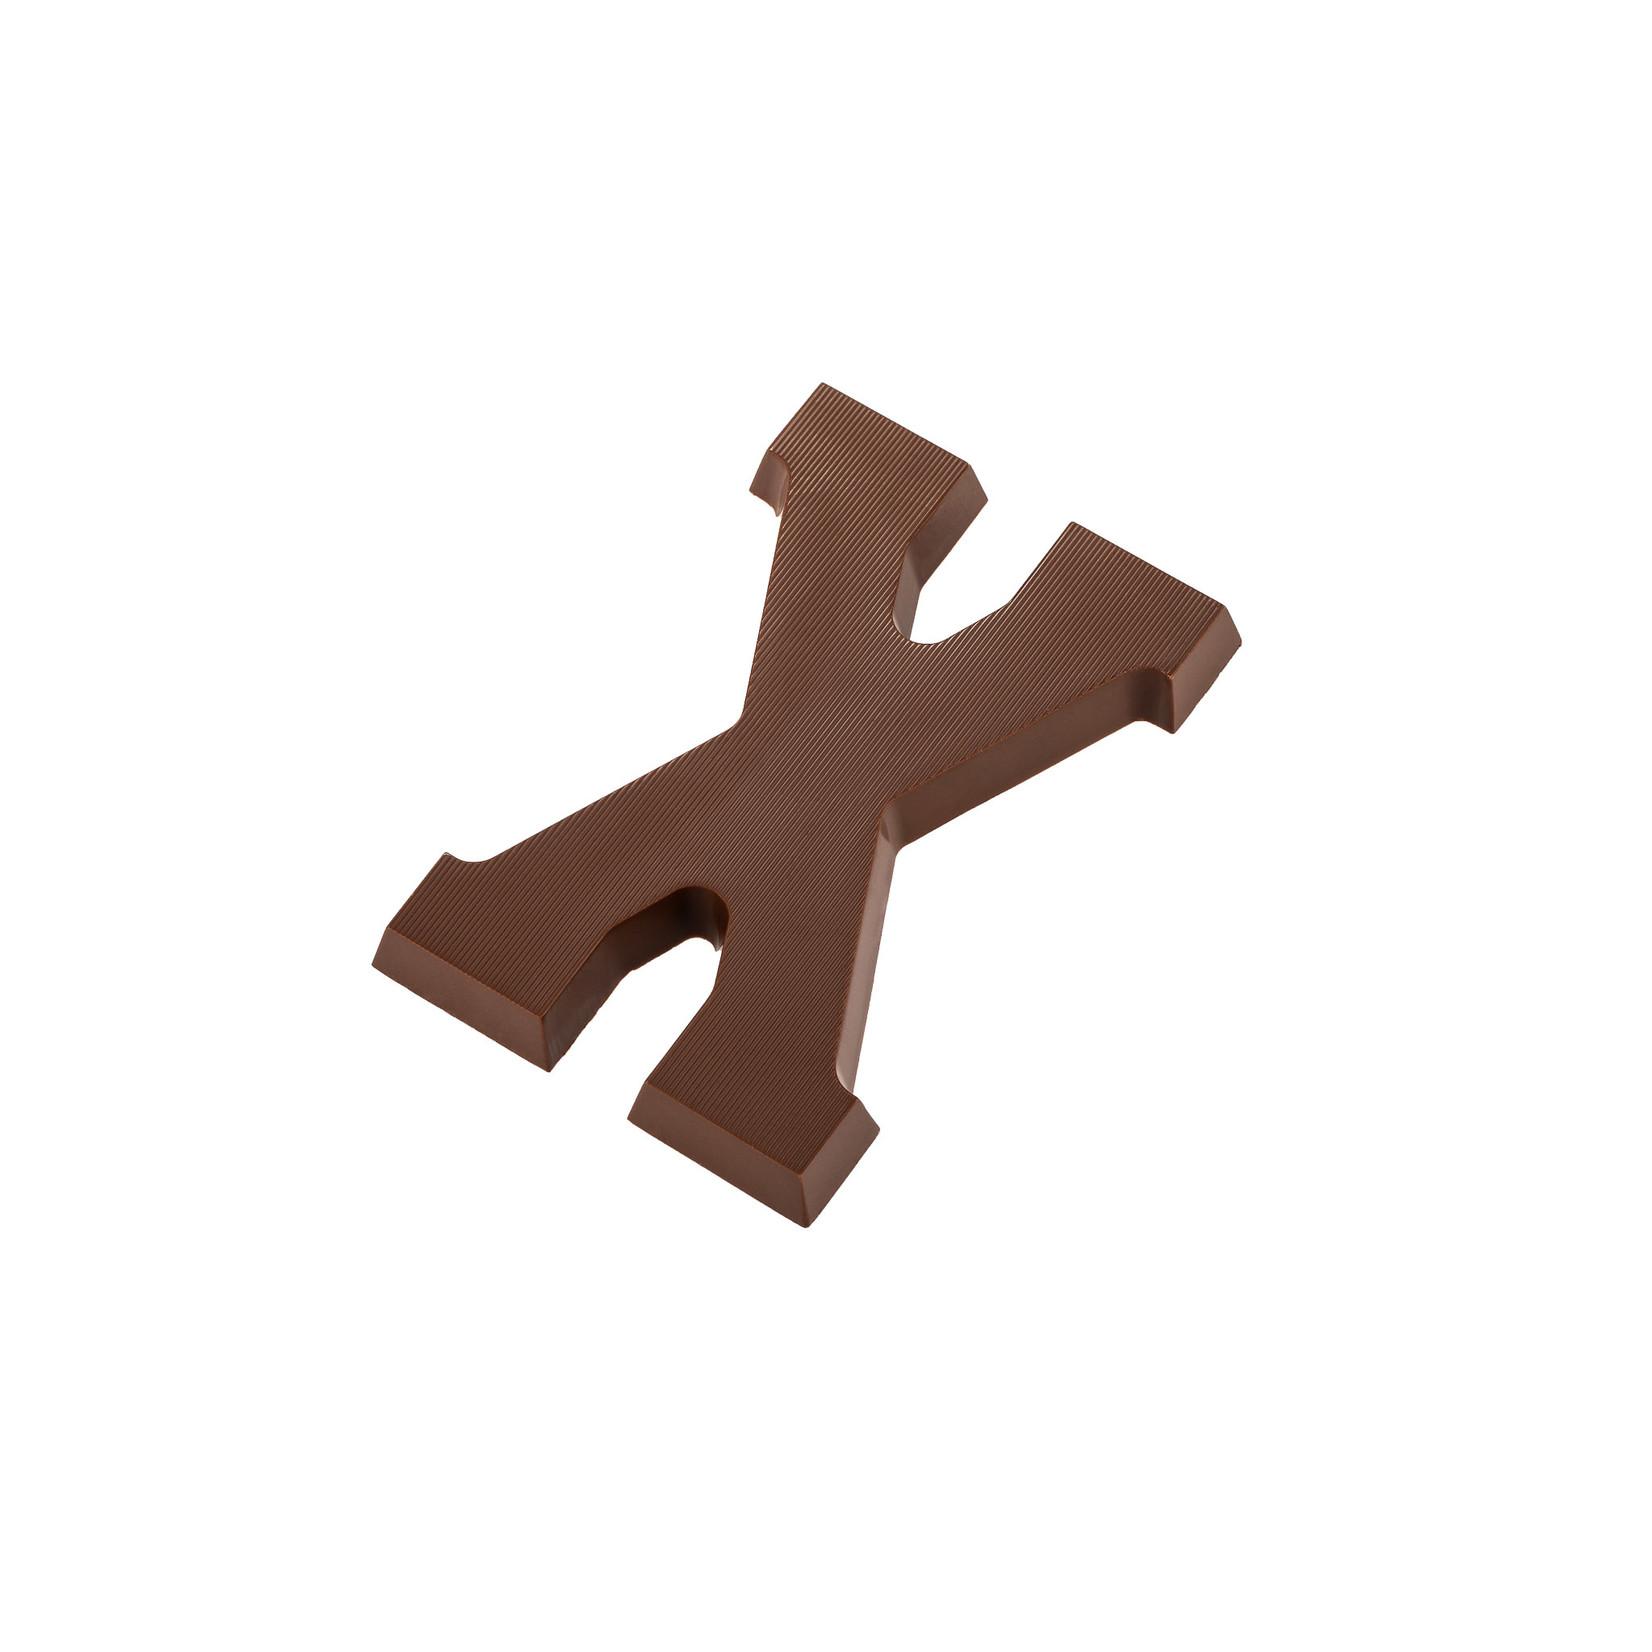 Chocolate letter - Milk